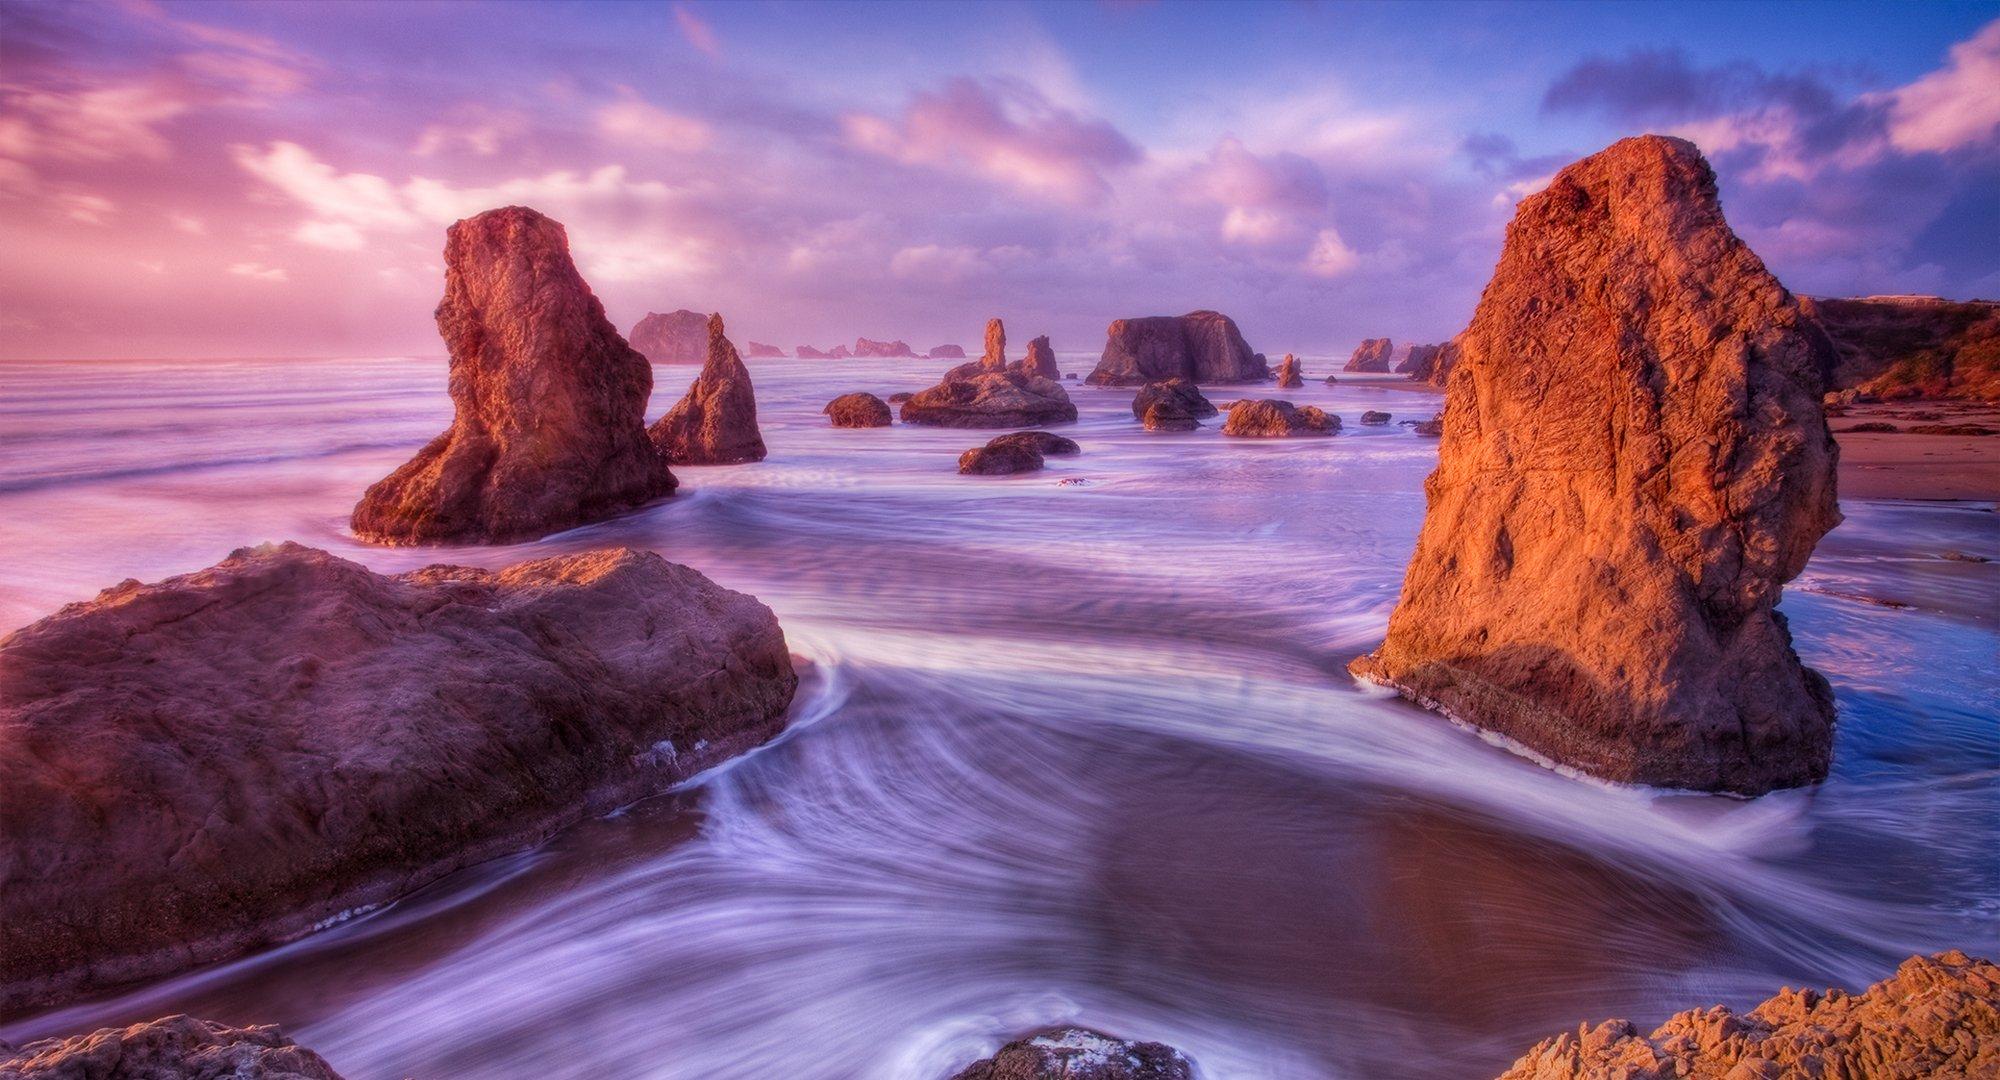 брызги вода море камень  № 2149643 без смс